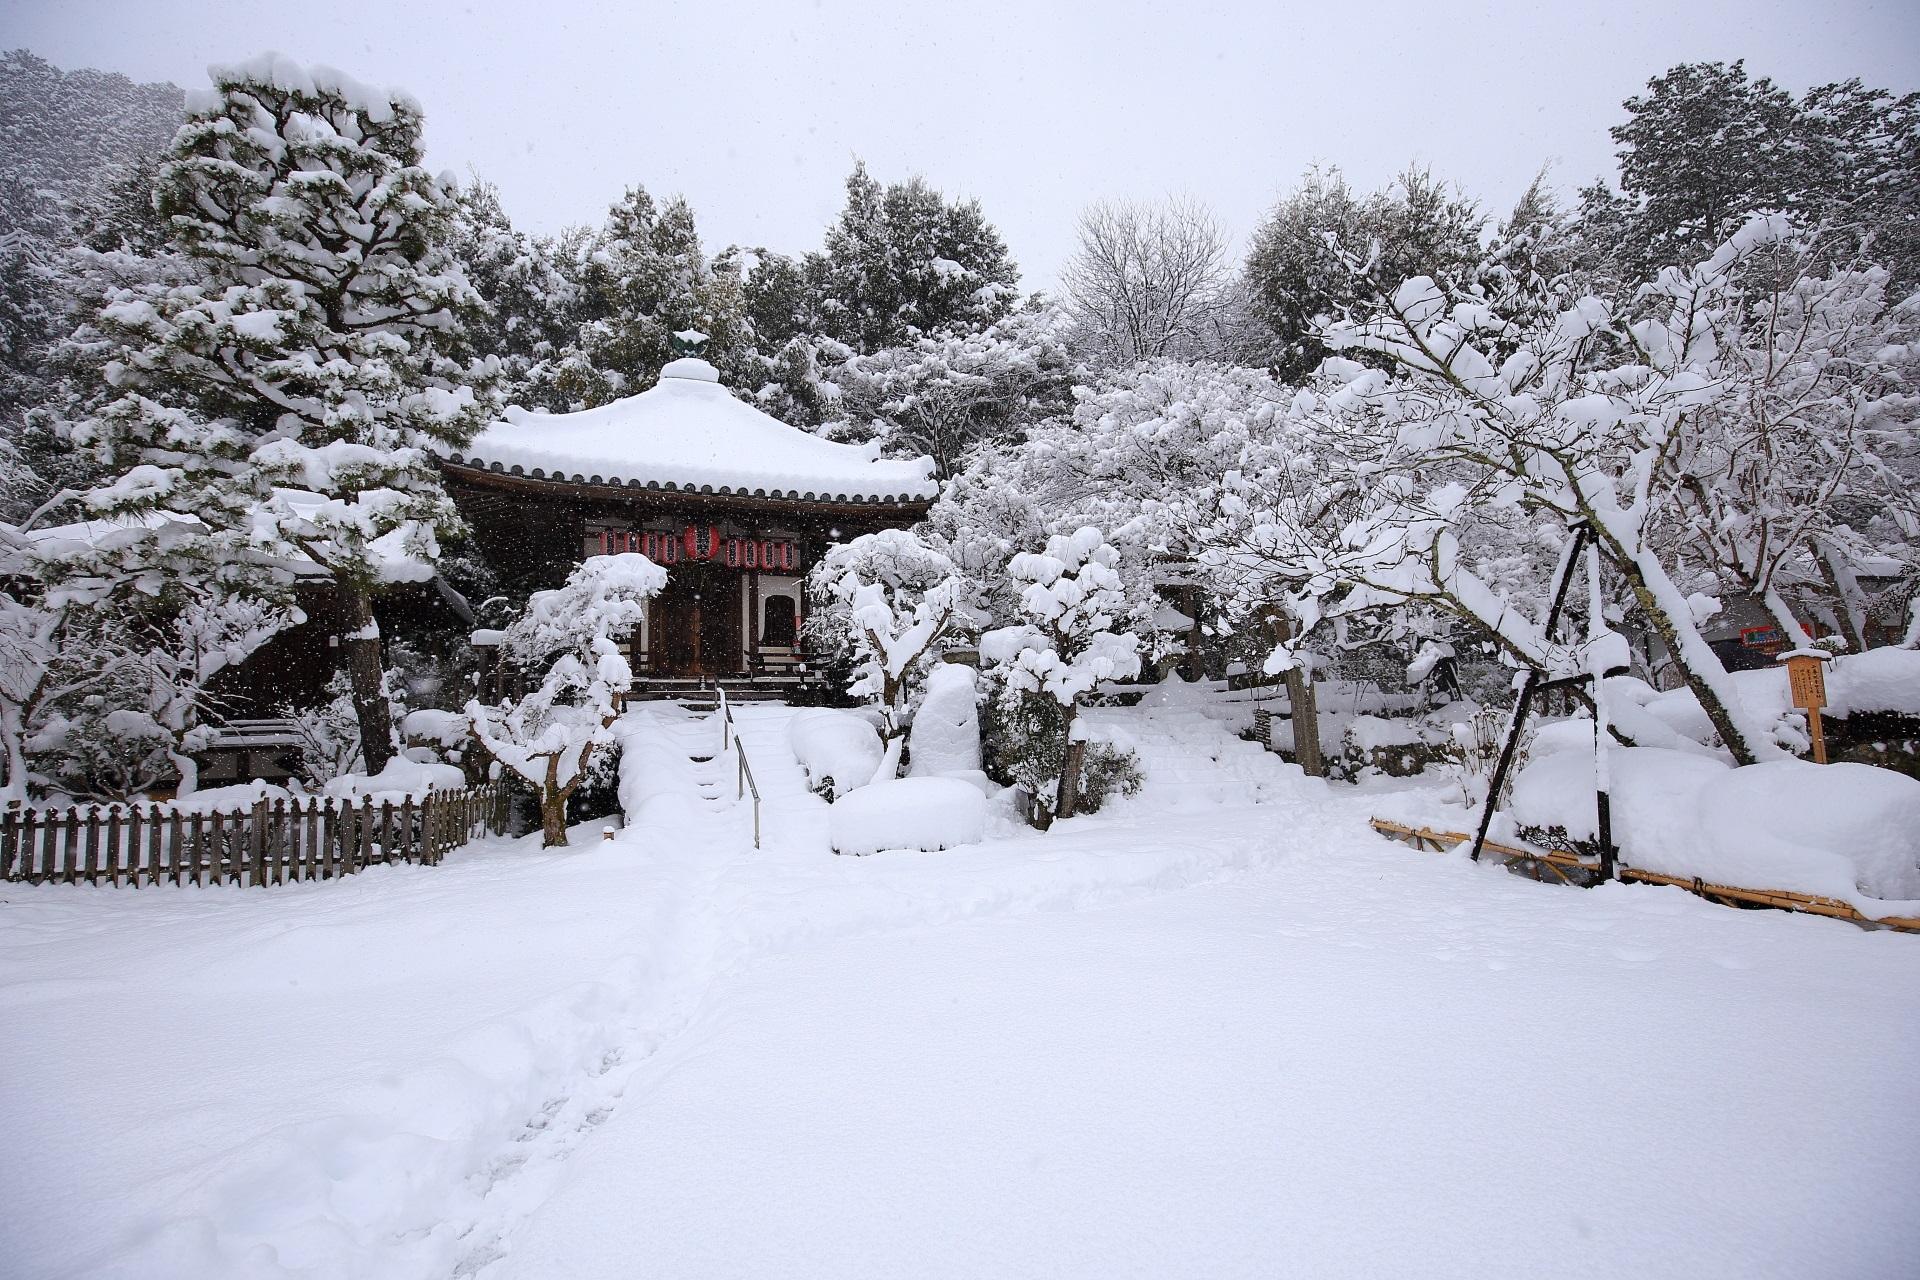 九頭龍弁財天の雪景色